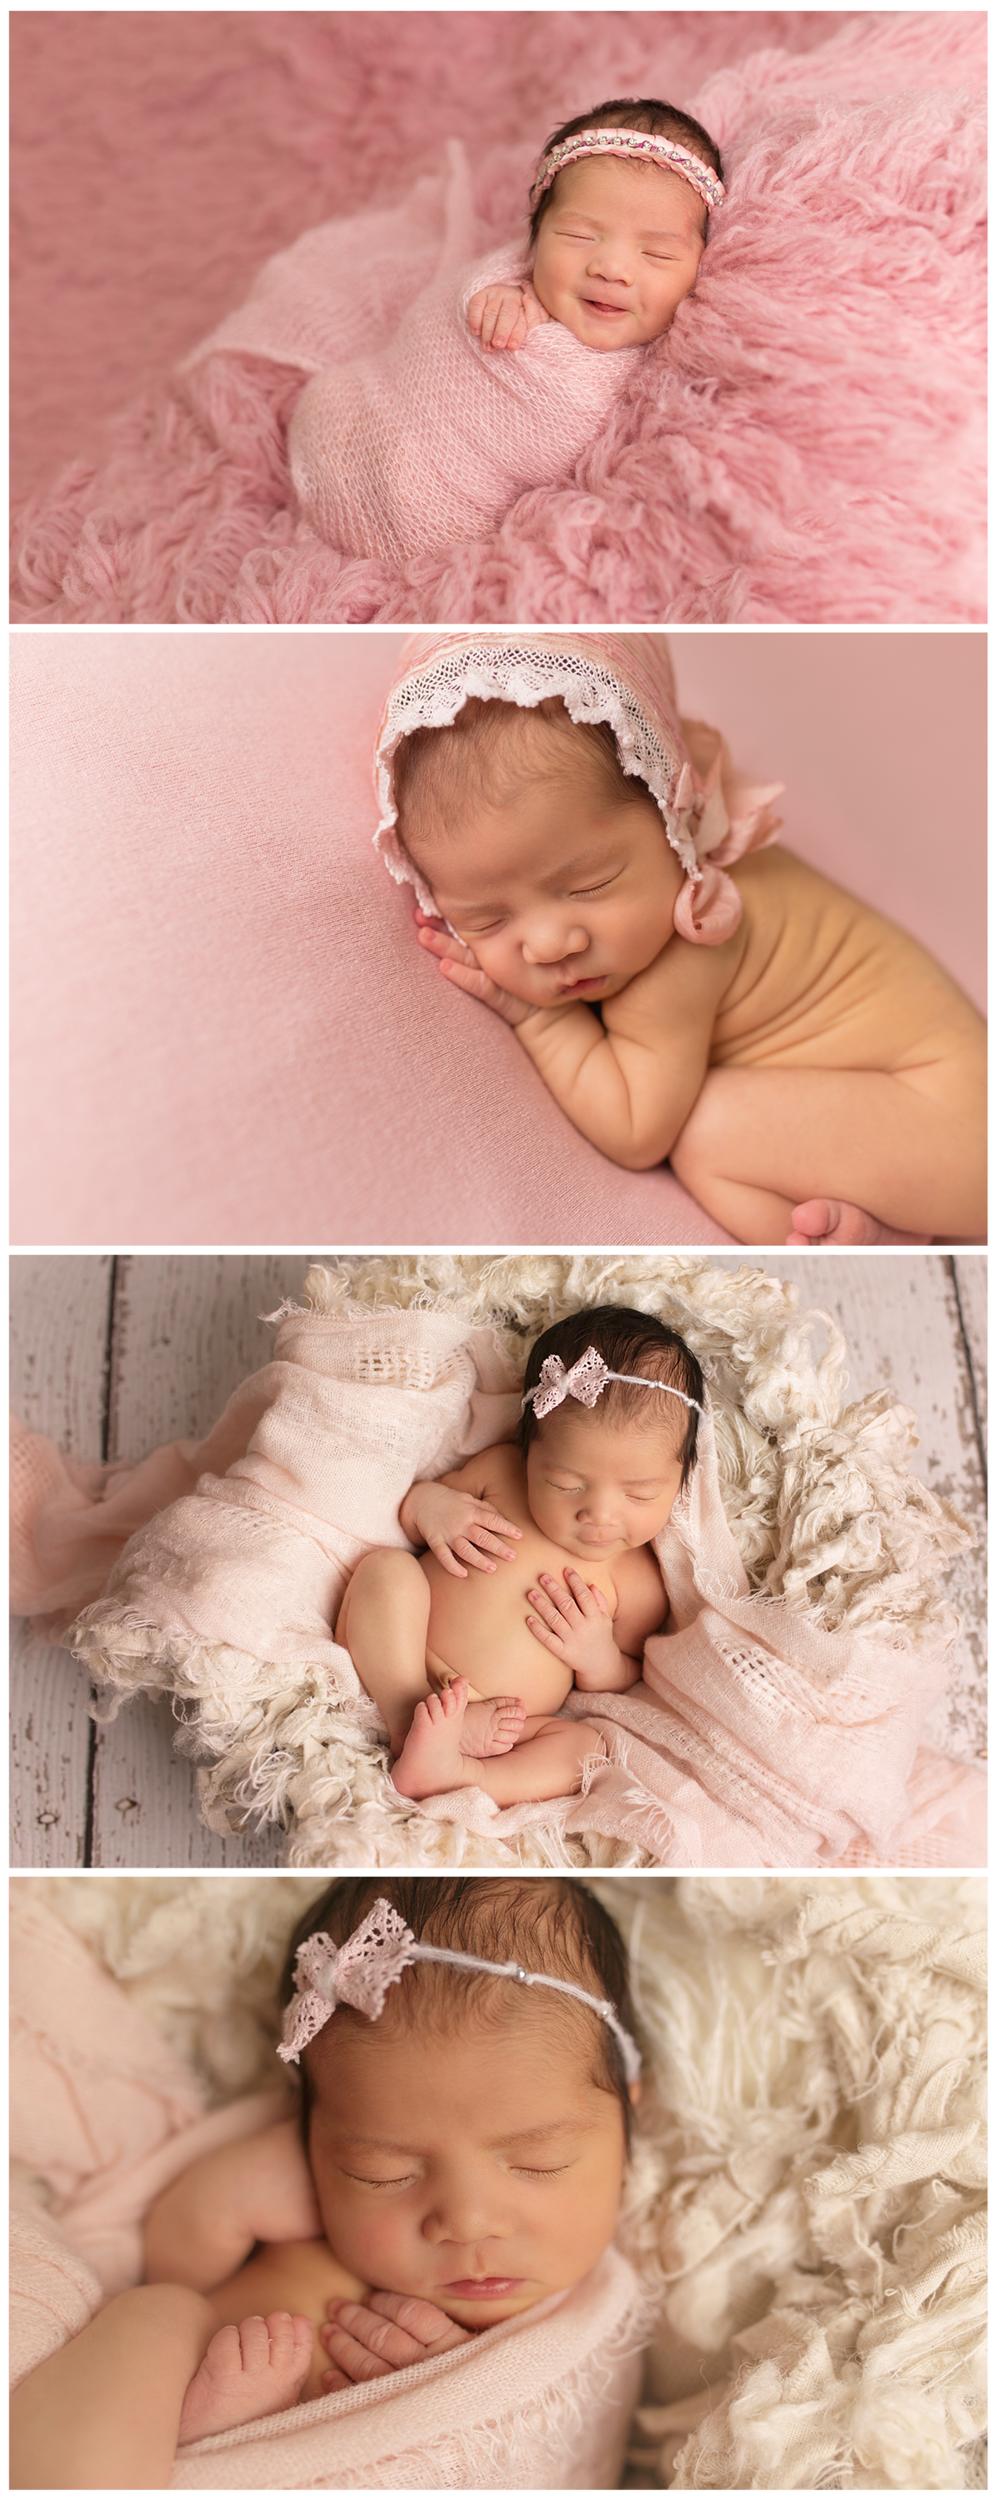 Pink Newborn Session #Utahnewbornphotographer #HeberUtahNewbornphotographer #twyladawnphotography